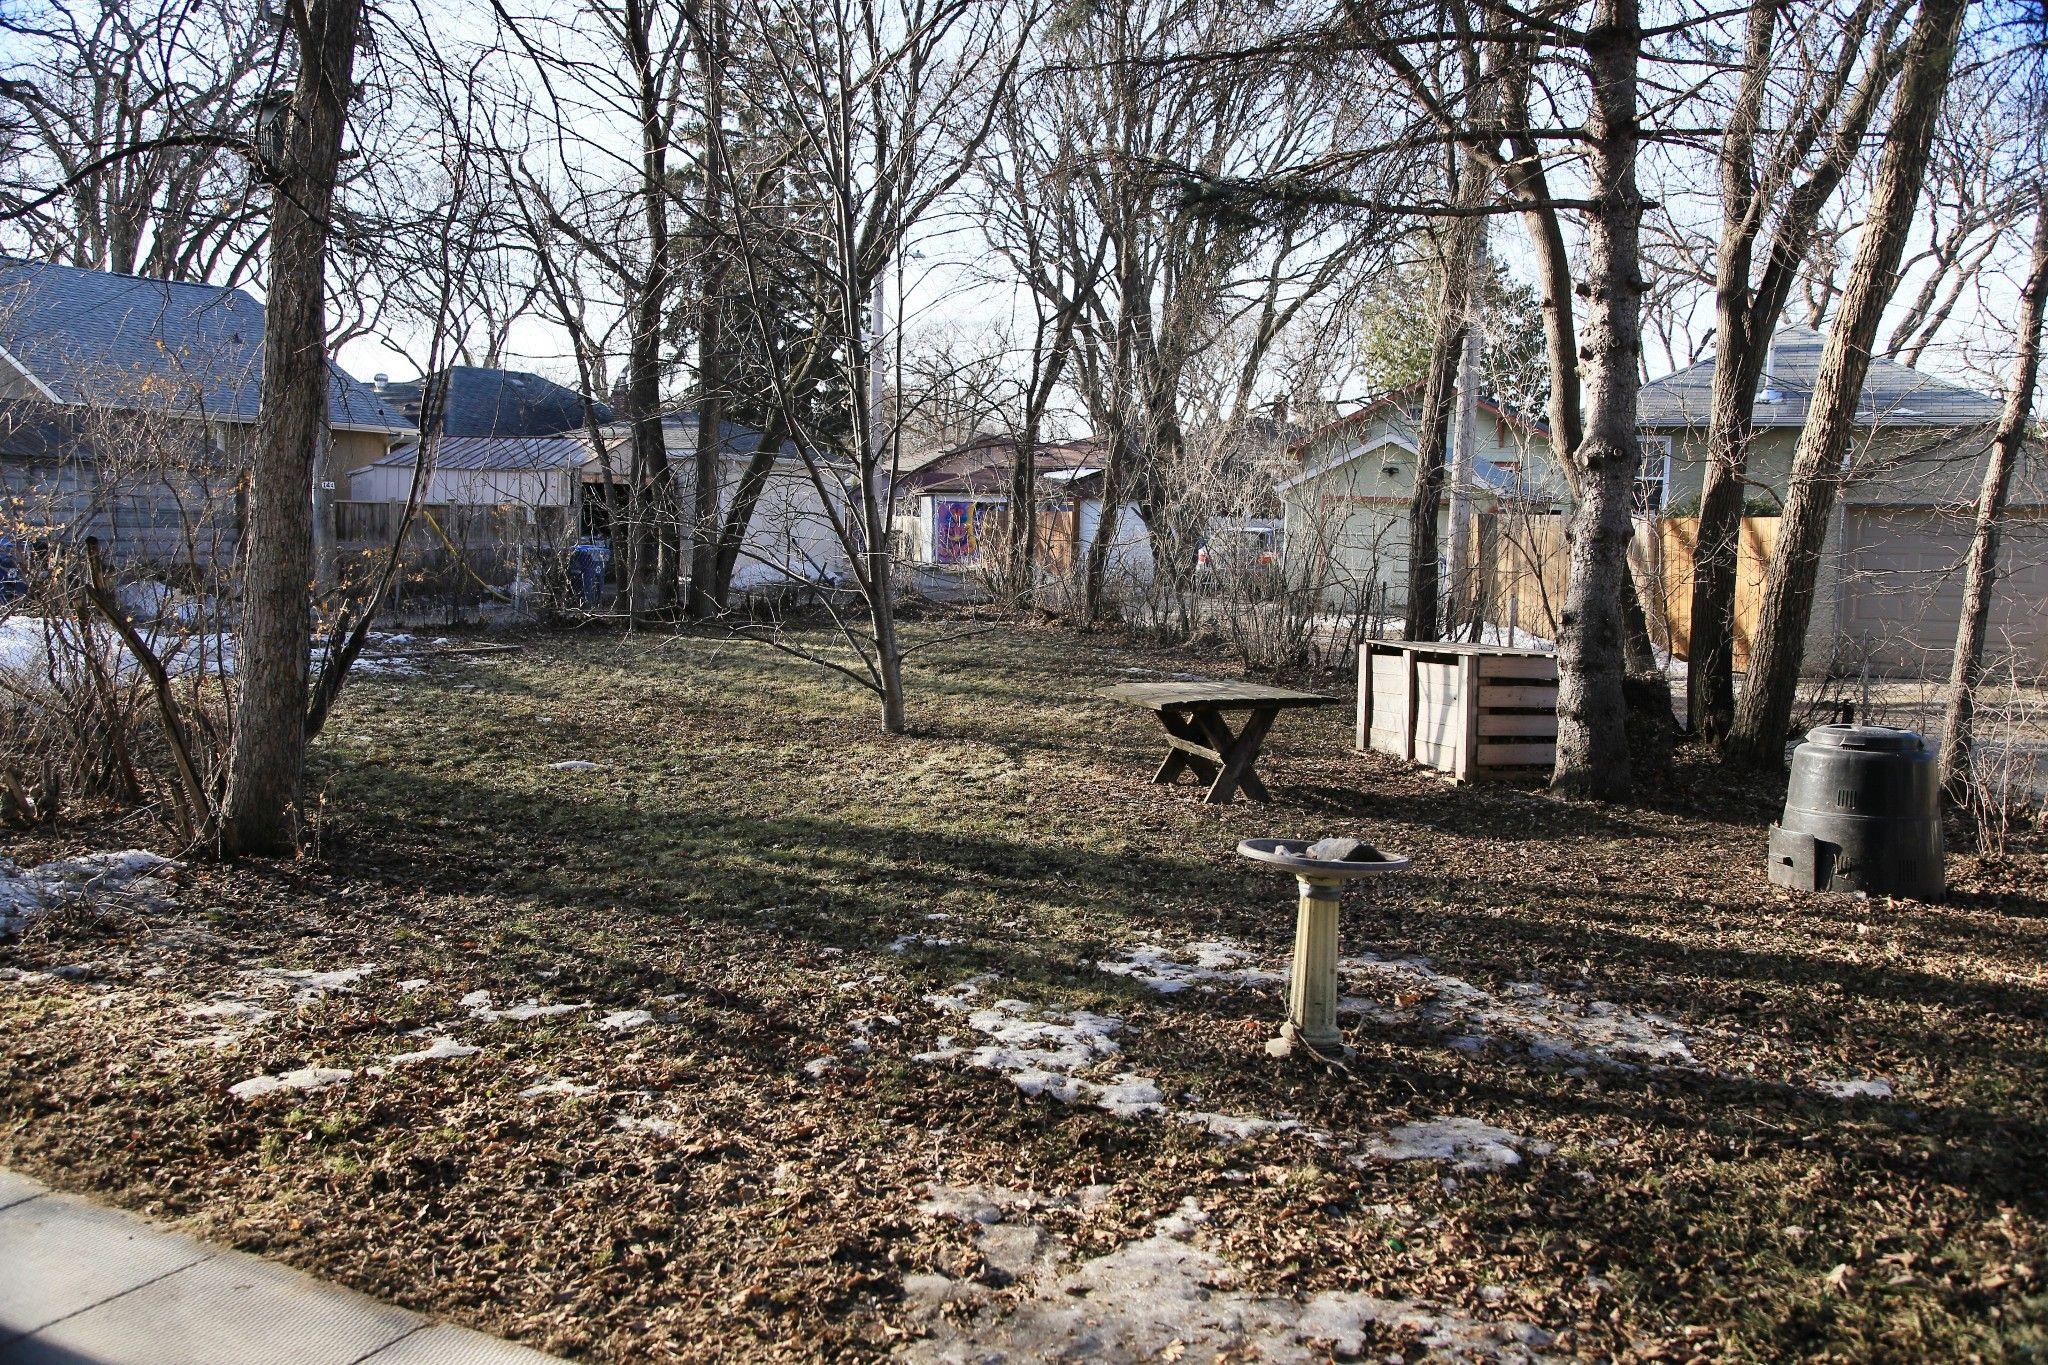 Photo 3: Photos: 109 Garfield Street South in Winnipeg: Wolseley Single Family Detached for sale (5B)  : MLS®# 1808340